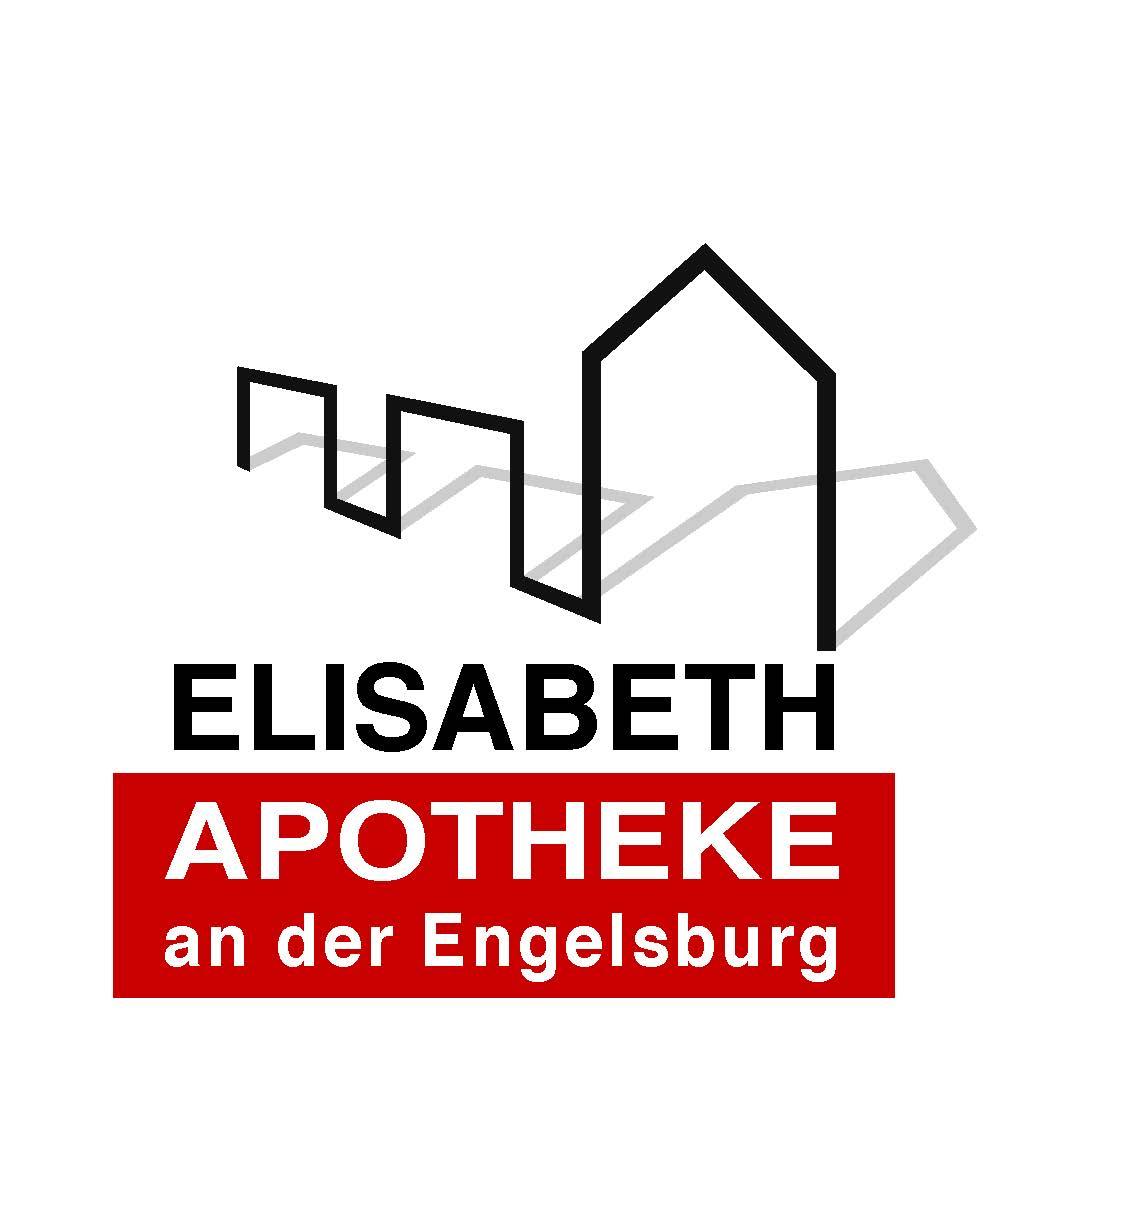 Elisabeth-Apotheke.jpg